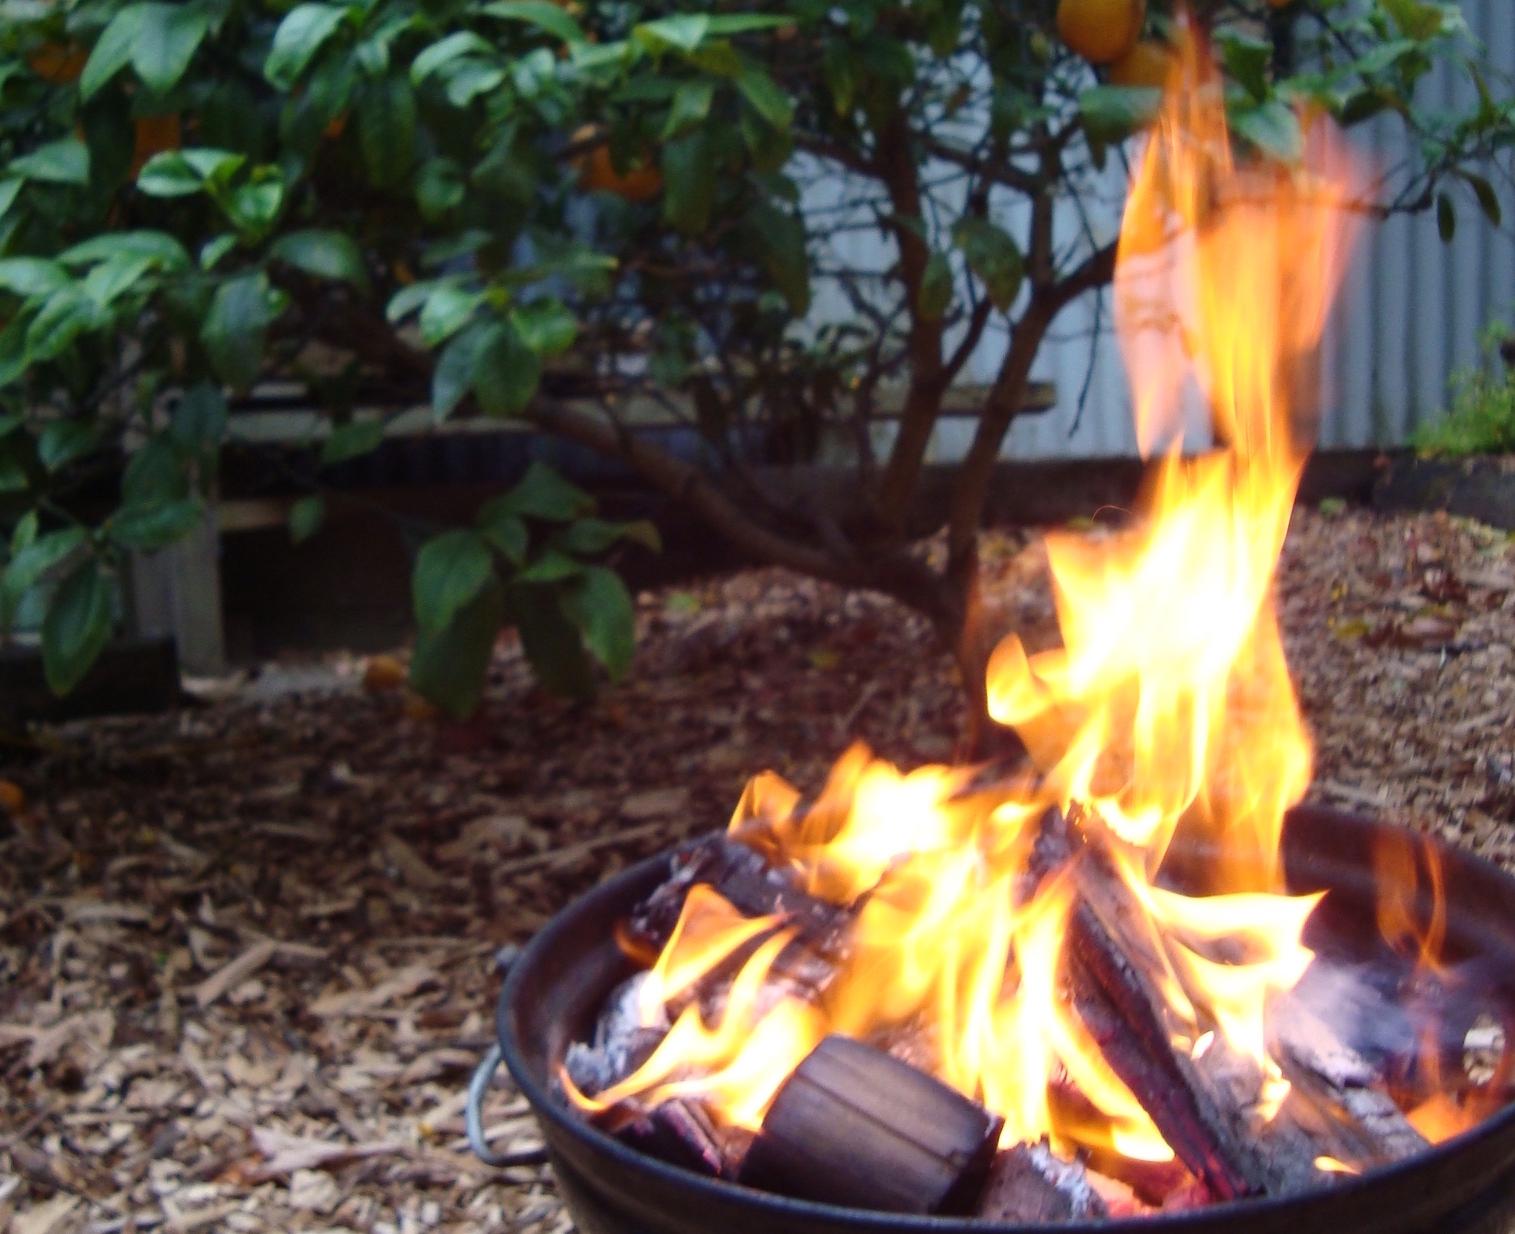 NZ summer BBQ in the Auckland back garden.